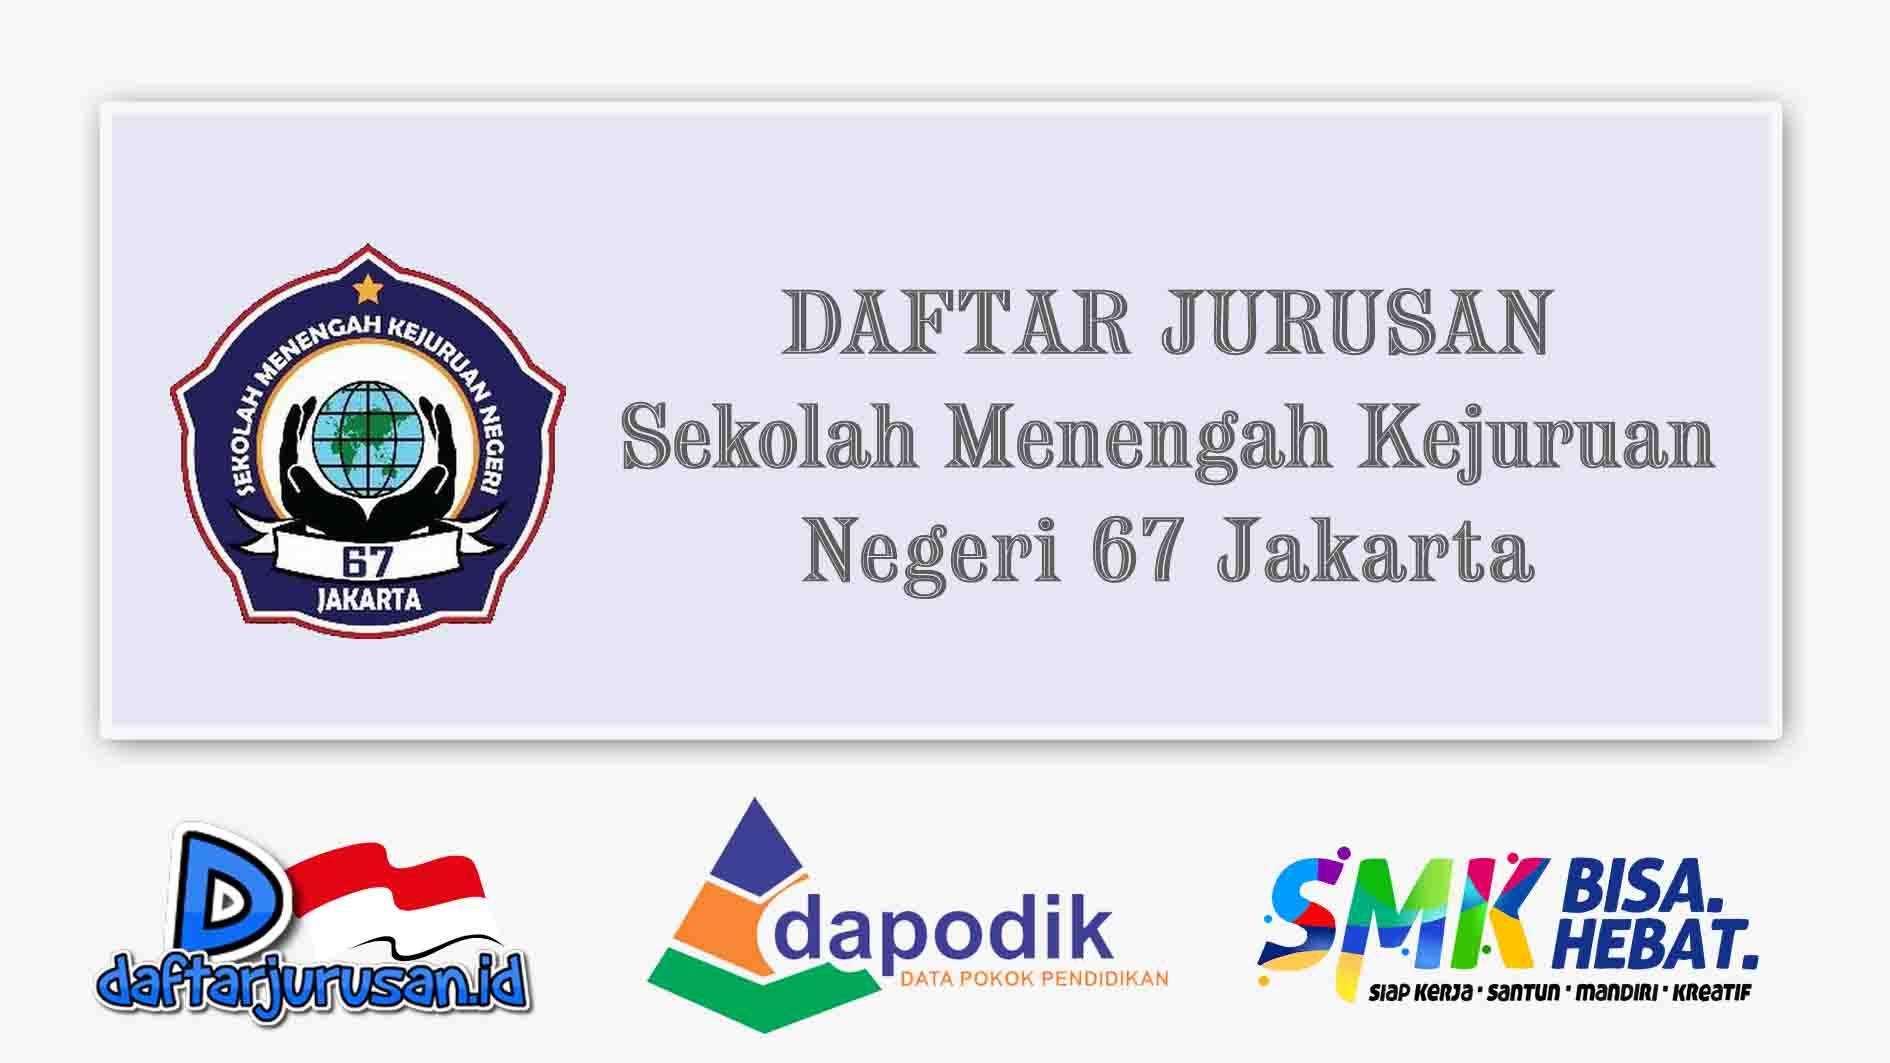 Daftar Jurusan SMK Negeri 67 Jakarta Timur